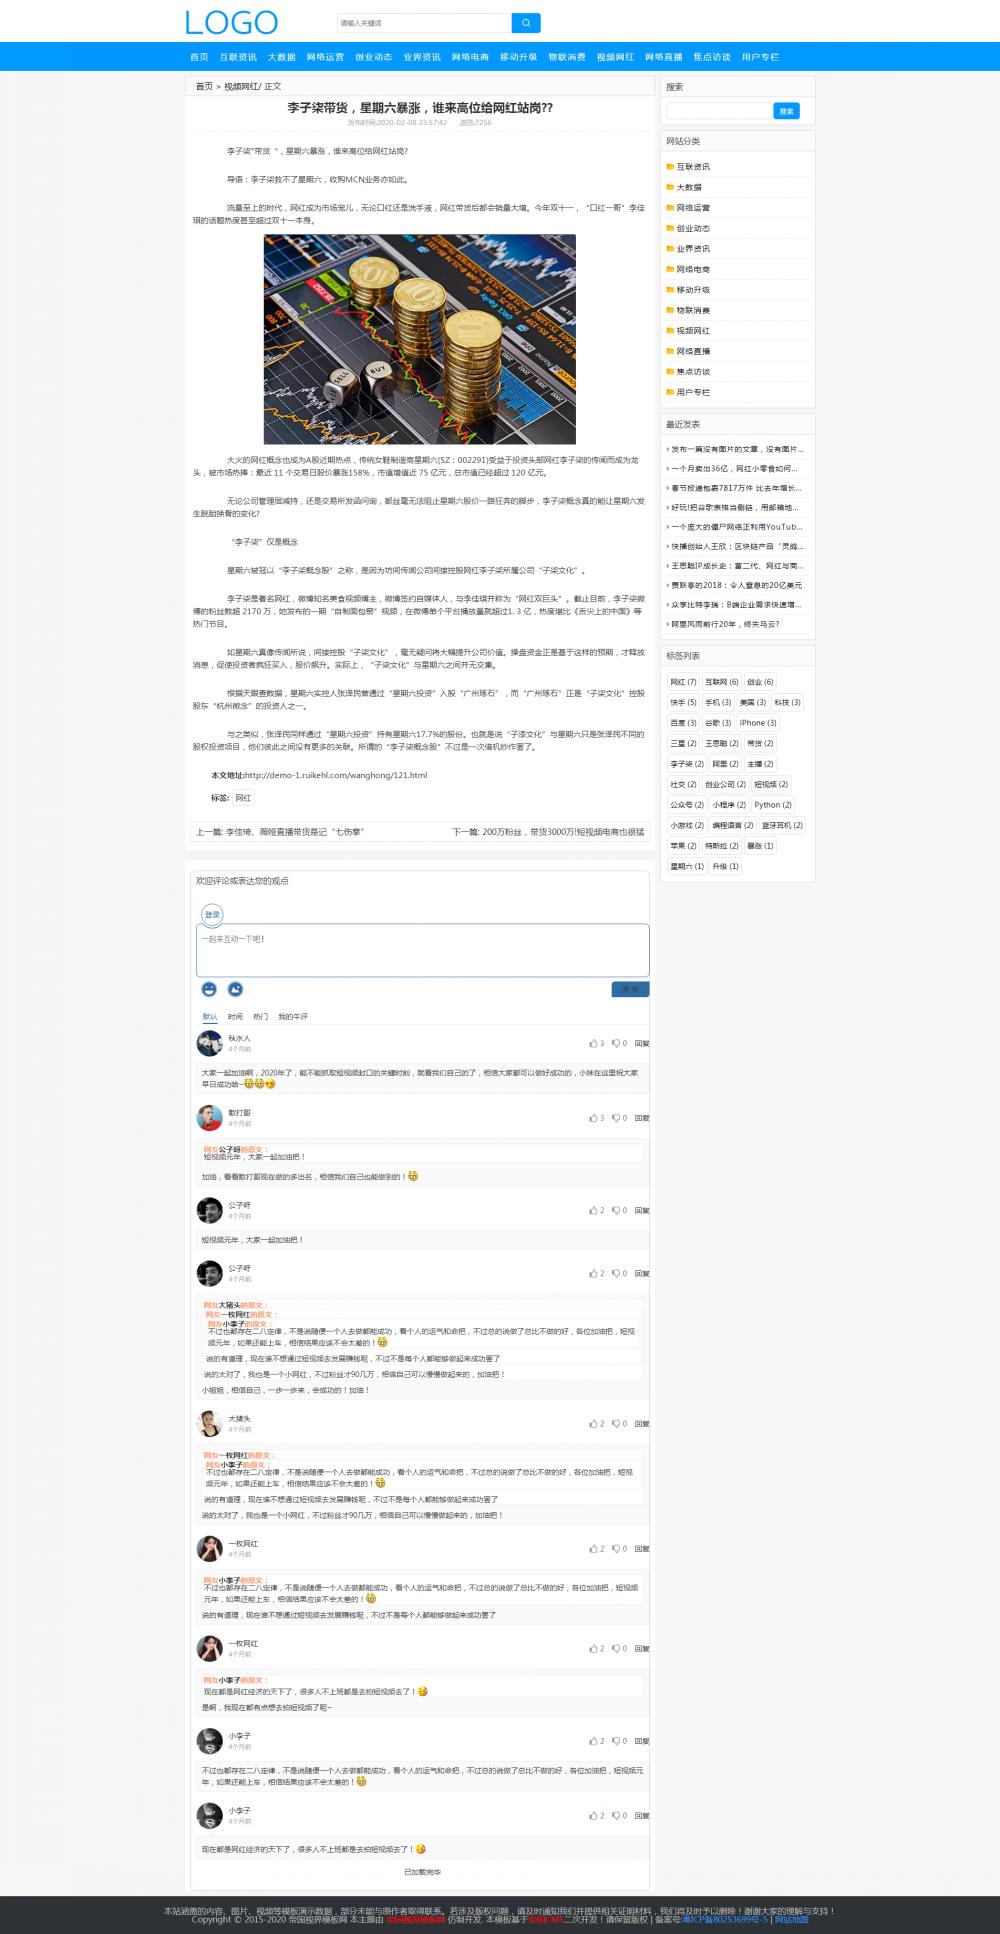 [DG-108]帝国CMS自适应新闻资讯模板,响应式新闻资讯模板(主题配色用户自定义控制) [DG-108]帝国CMS自适应新闻资讯模板,响应式新闻资讯模板(主题配色用户自定义控制) 新闻资讯 第4张